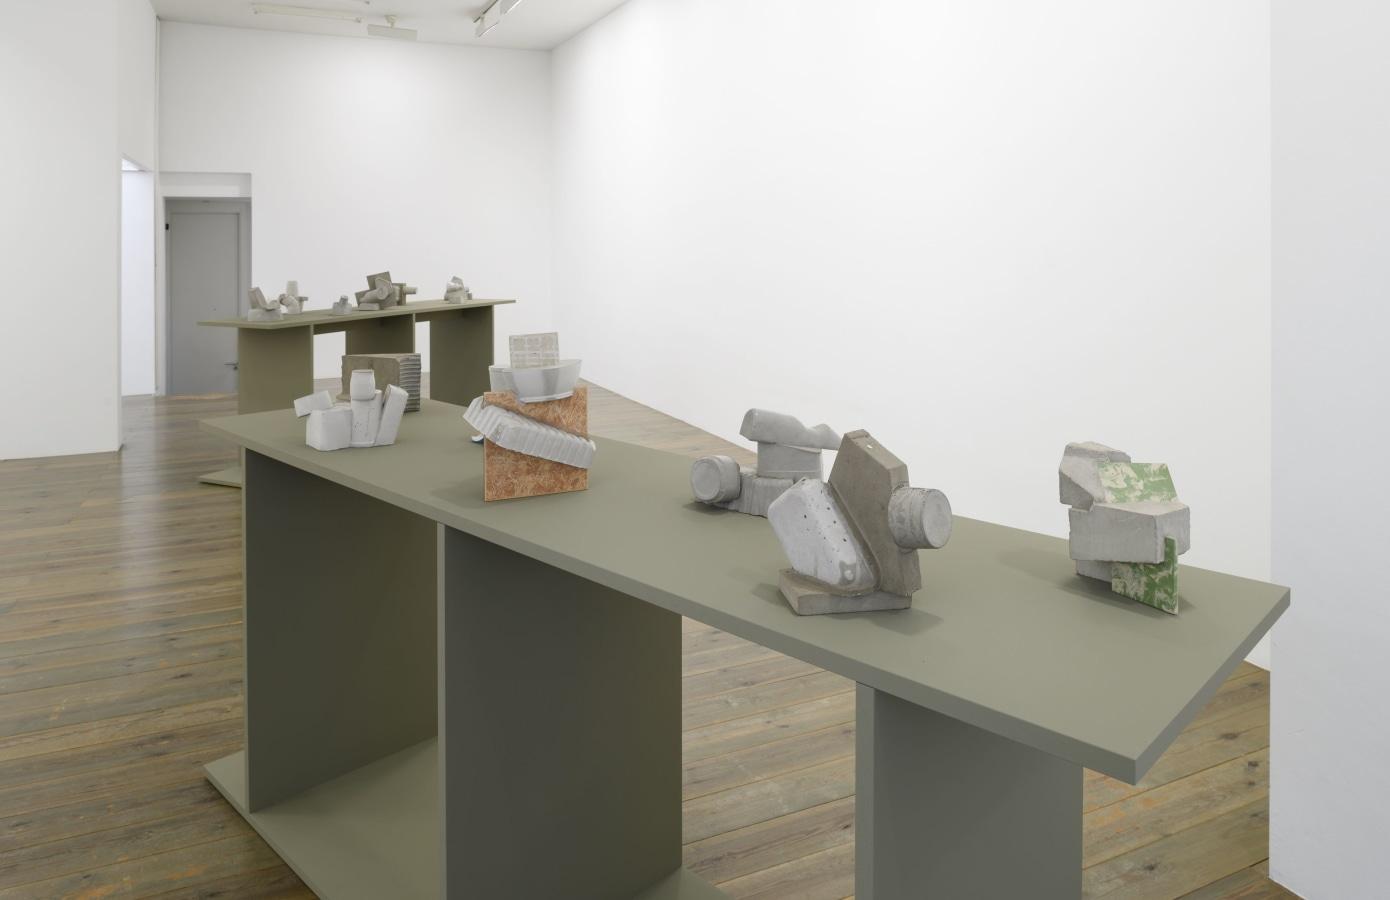 Ruud Kuijer, Lon Pennock: Small Sculptures, Ruud Kuijer, Lon Pennock,